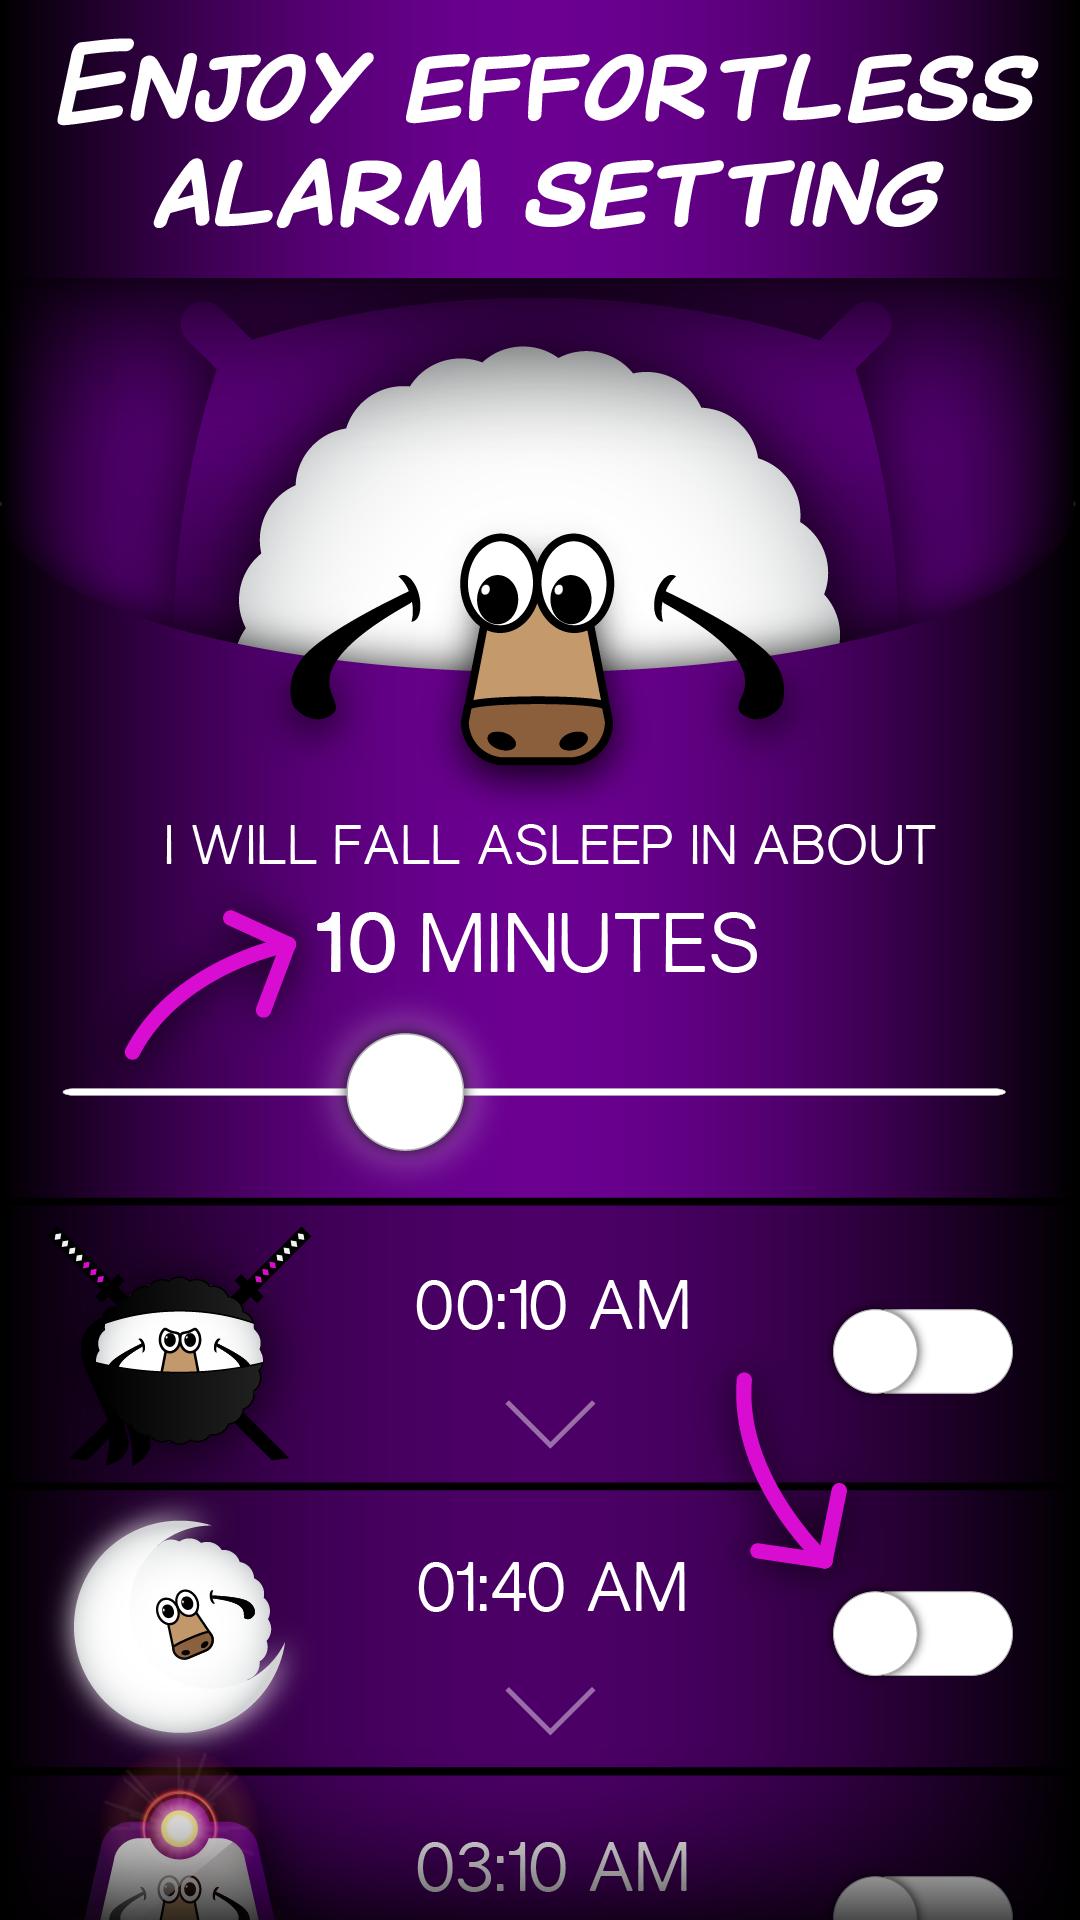 Sleep With Sheep in 90 Minute Cycles - Best Sleep Cycle Alarm Clock for iPhone (www.sleepwithsheep.com)